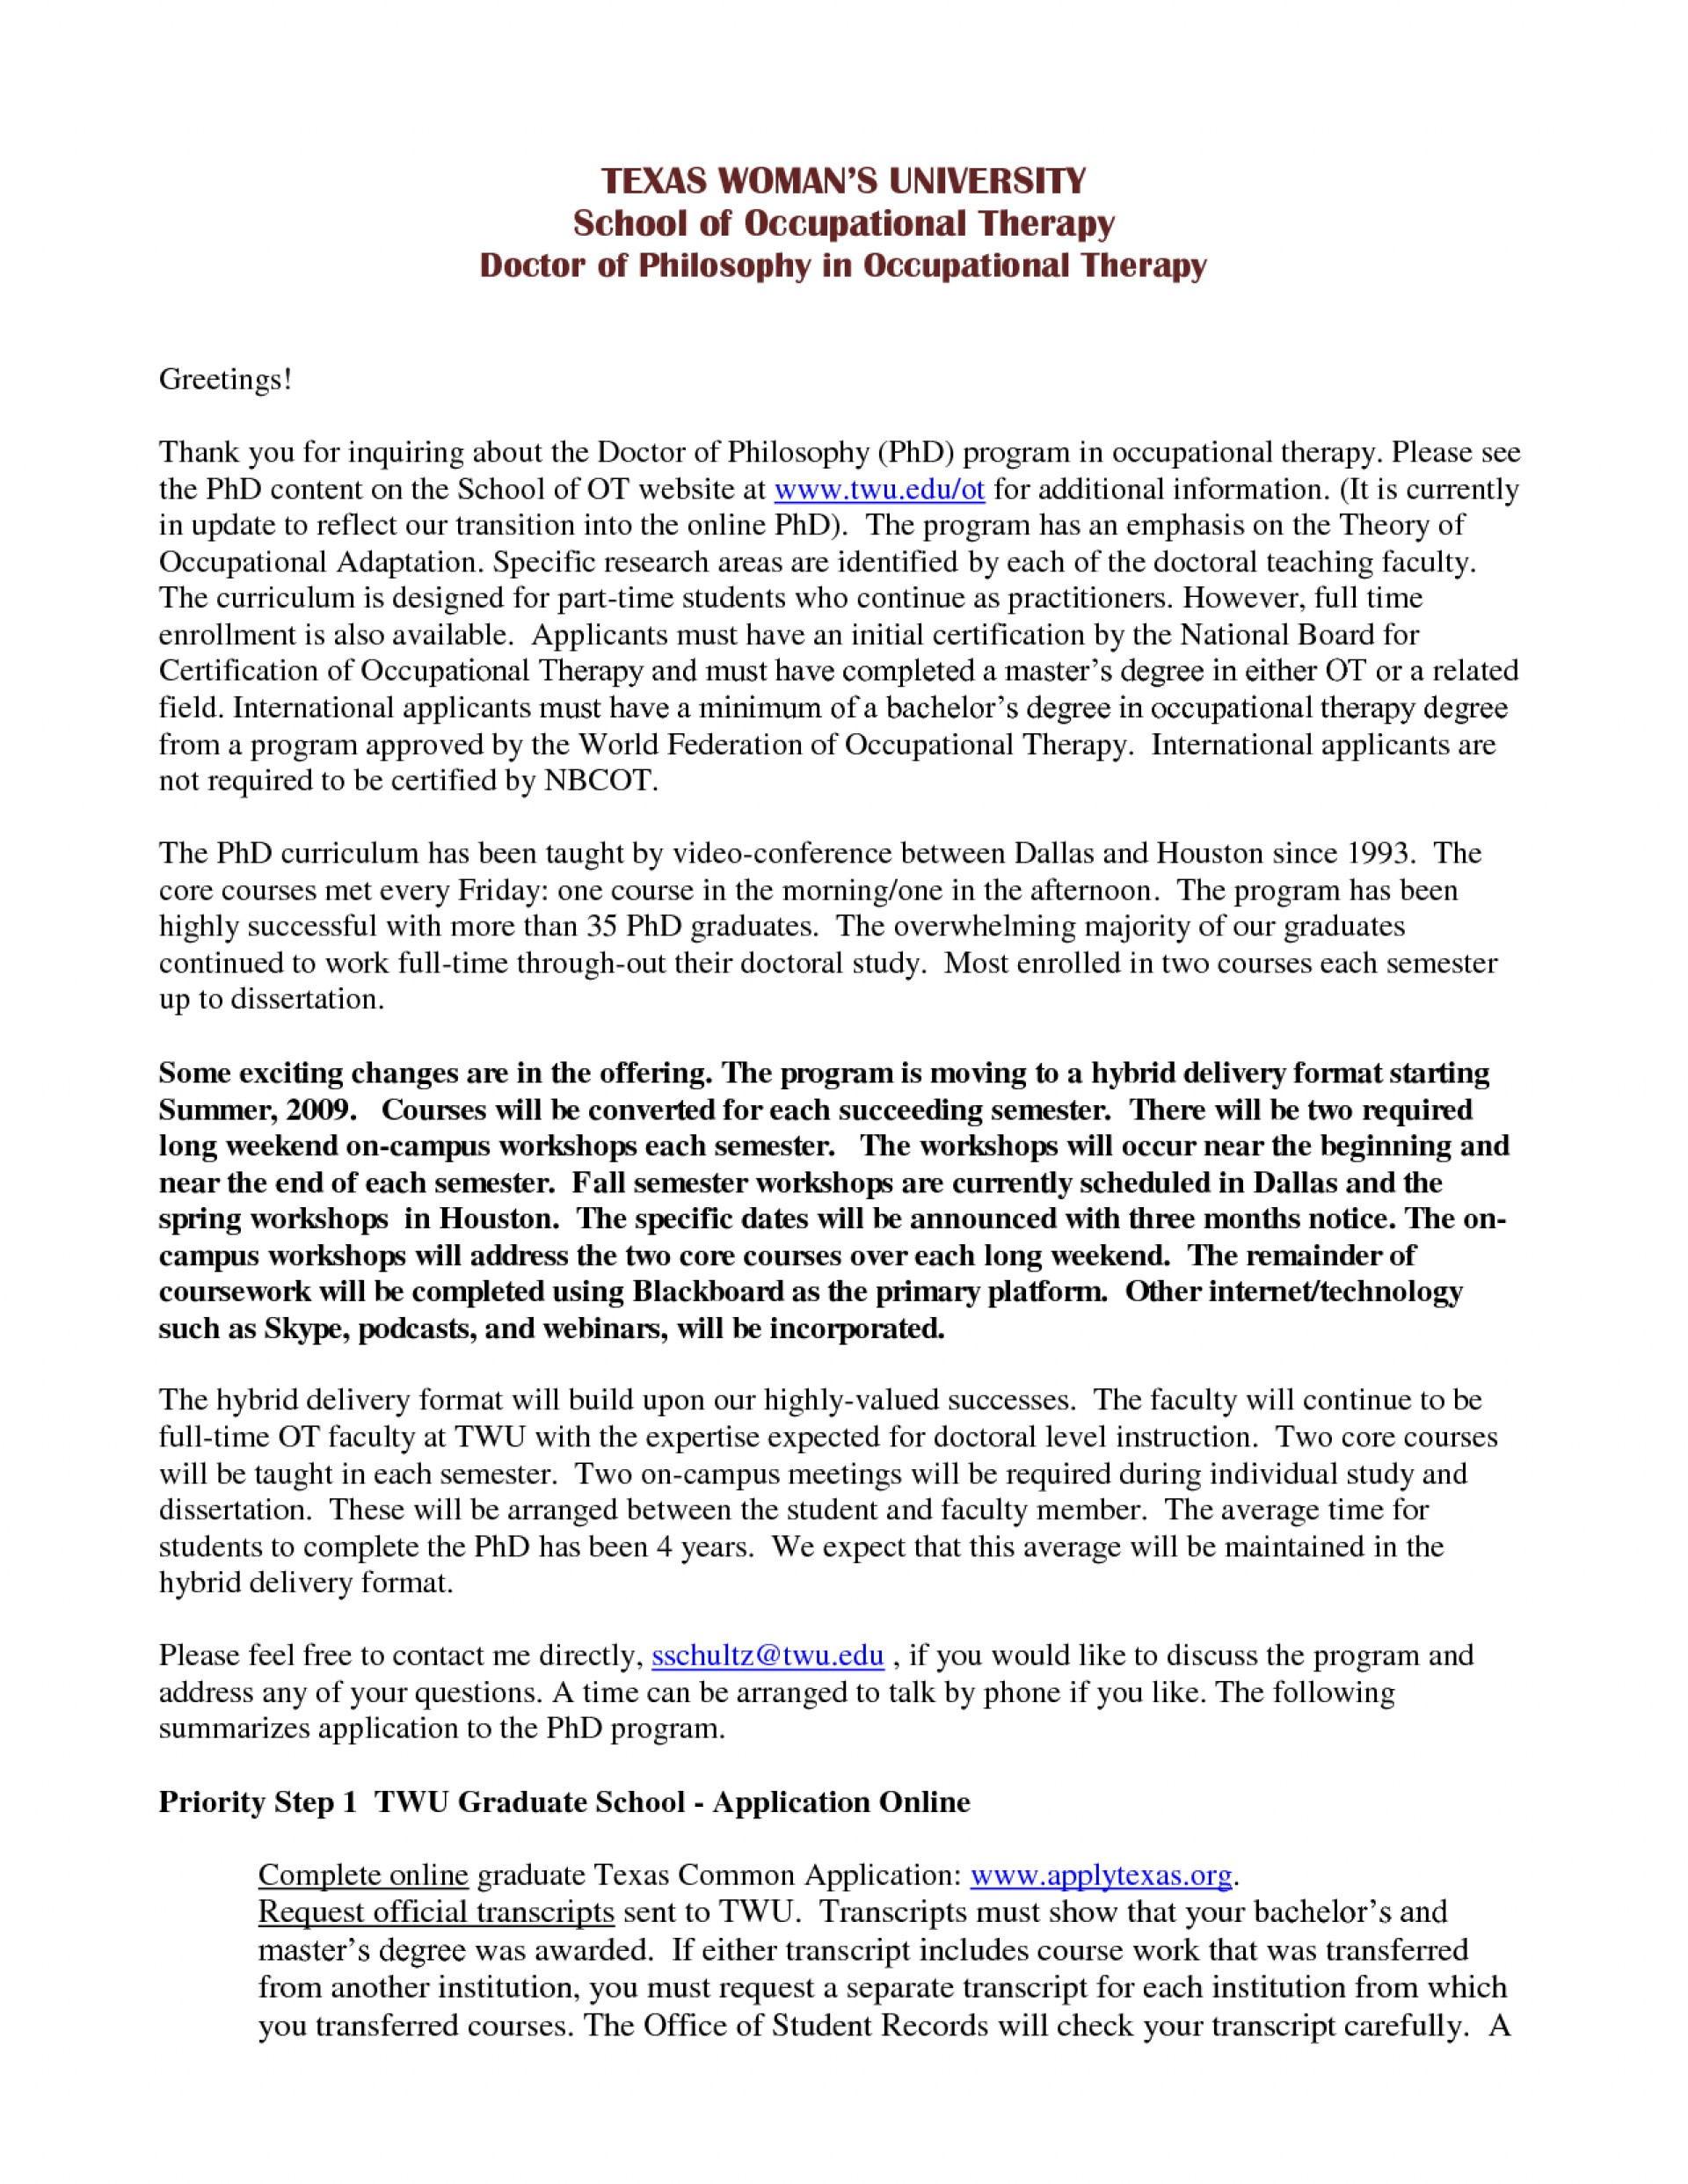 Psychology masters program personal statement